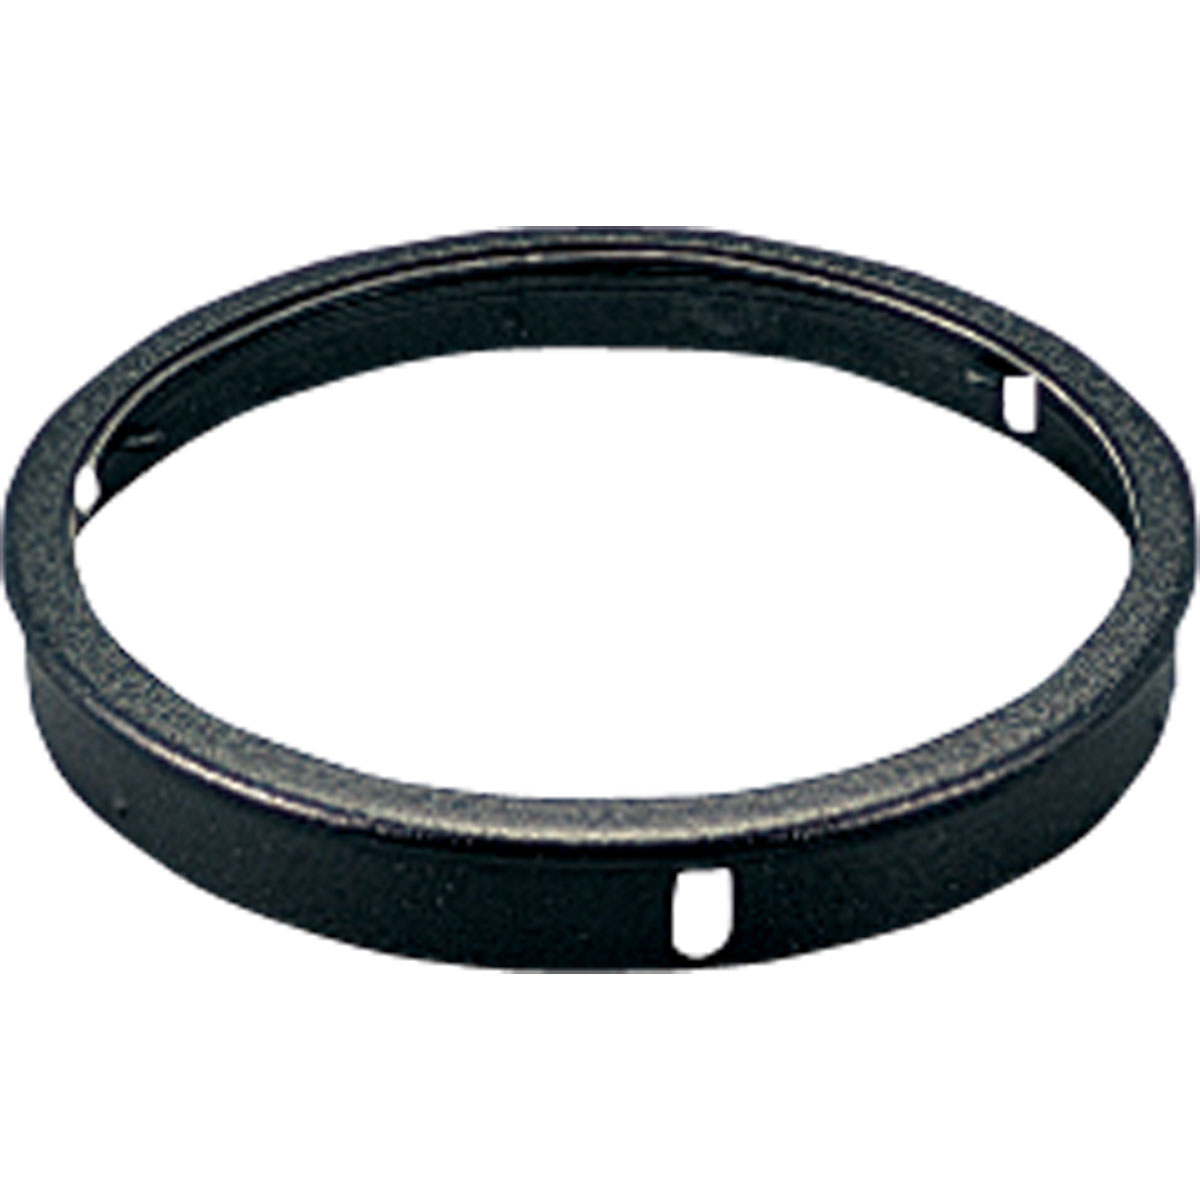 PROGRESS,P8799-31,Progress Lighting® P8799-31 Top Cover Lens, For Use With P5675 Aluminum Cylinder, Fixture Mount